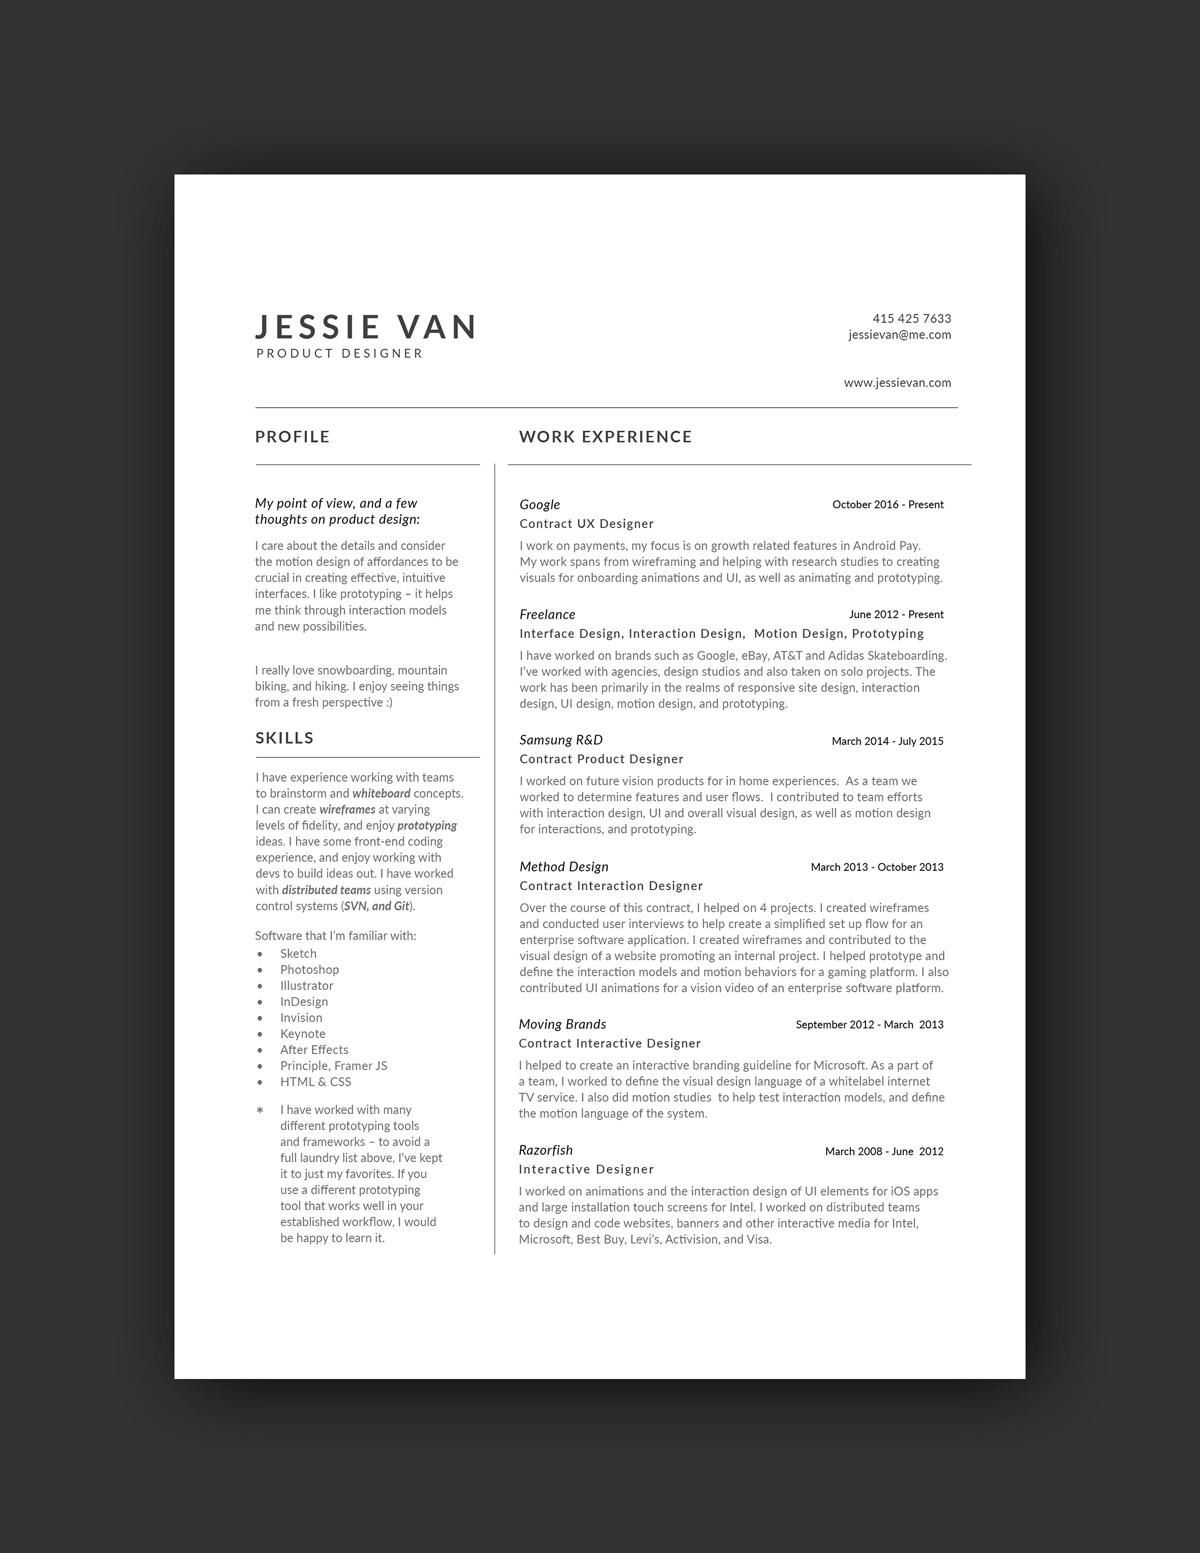 Jessie Van Resume Example Resume Design Ux Design Resume Examples